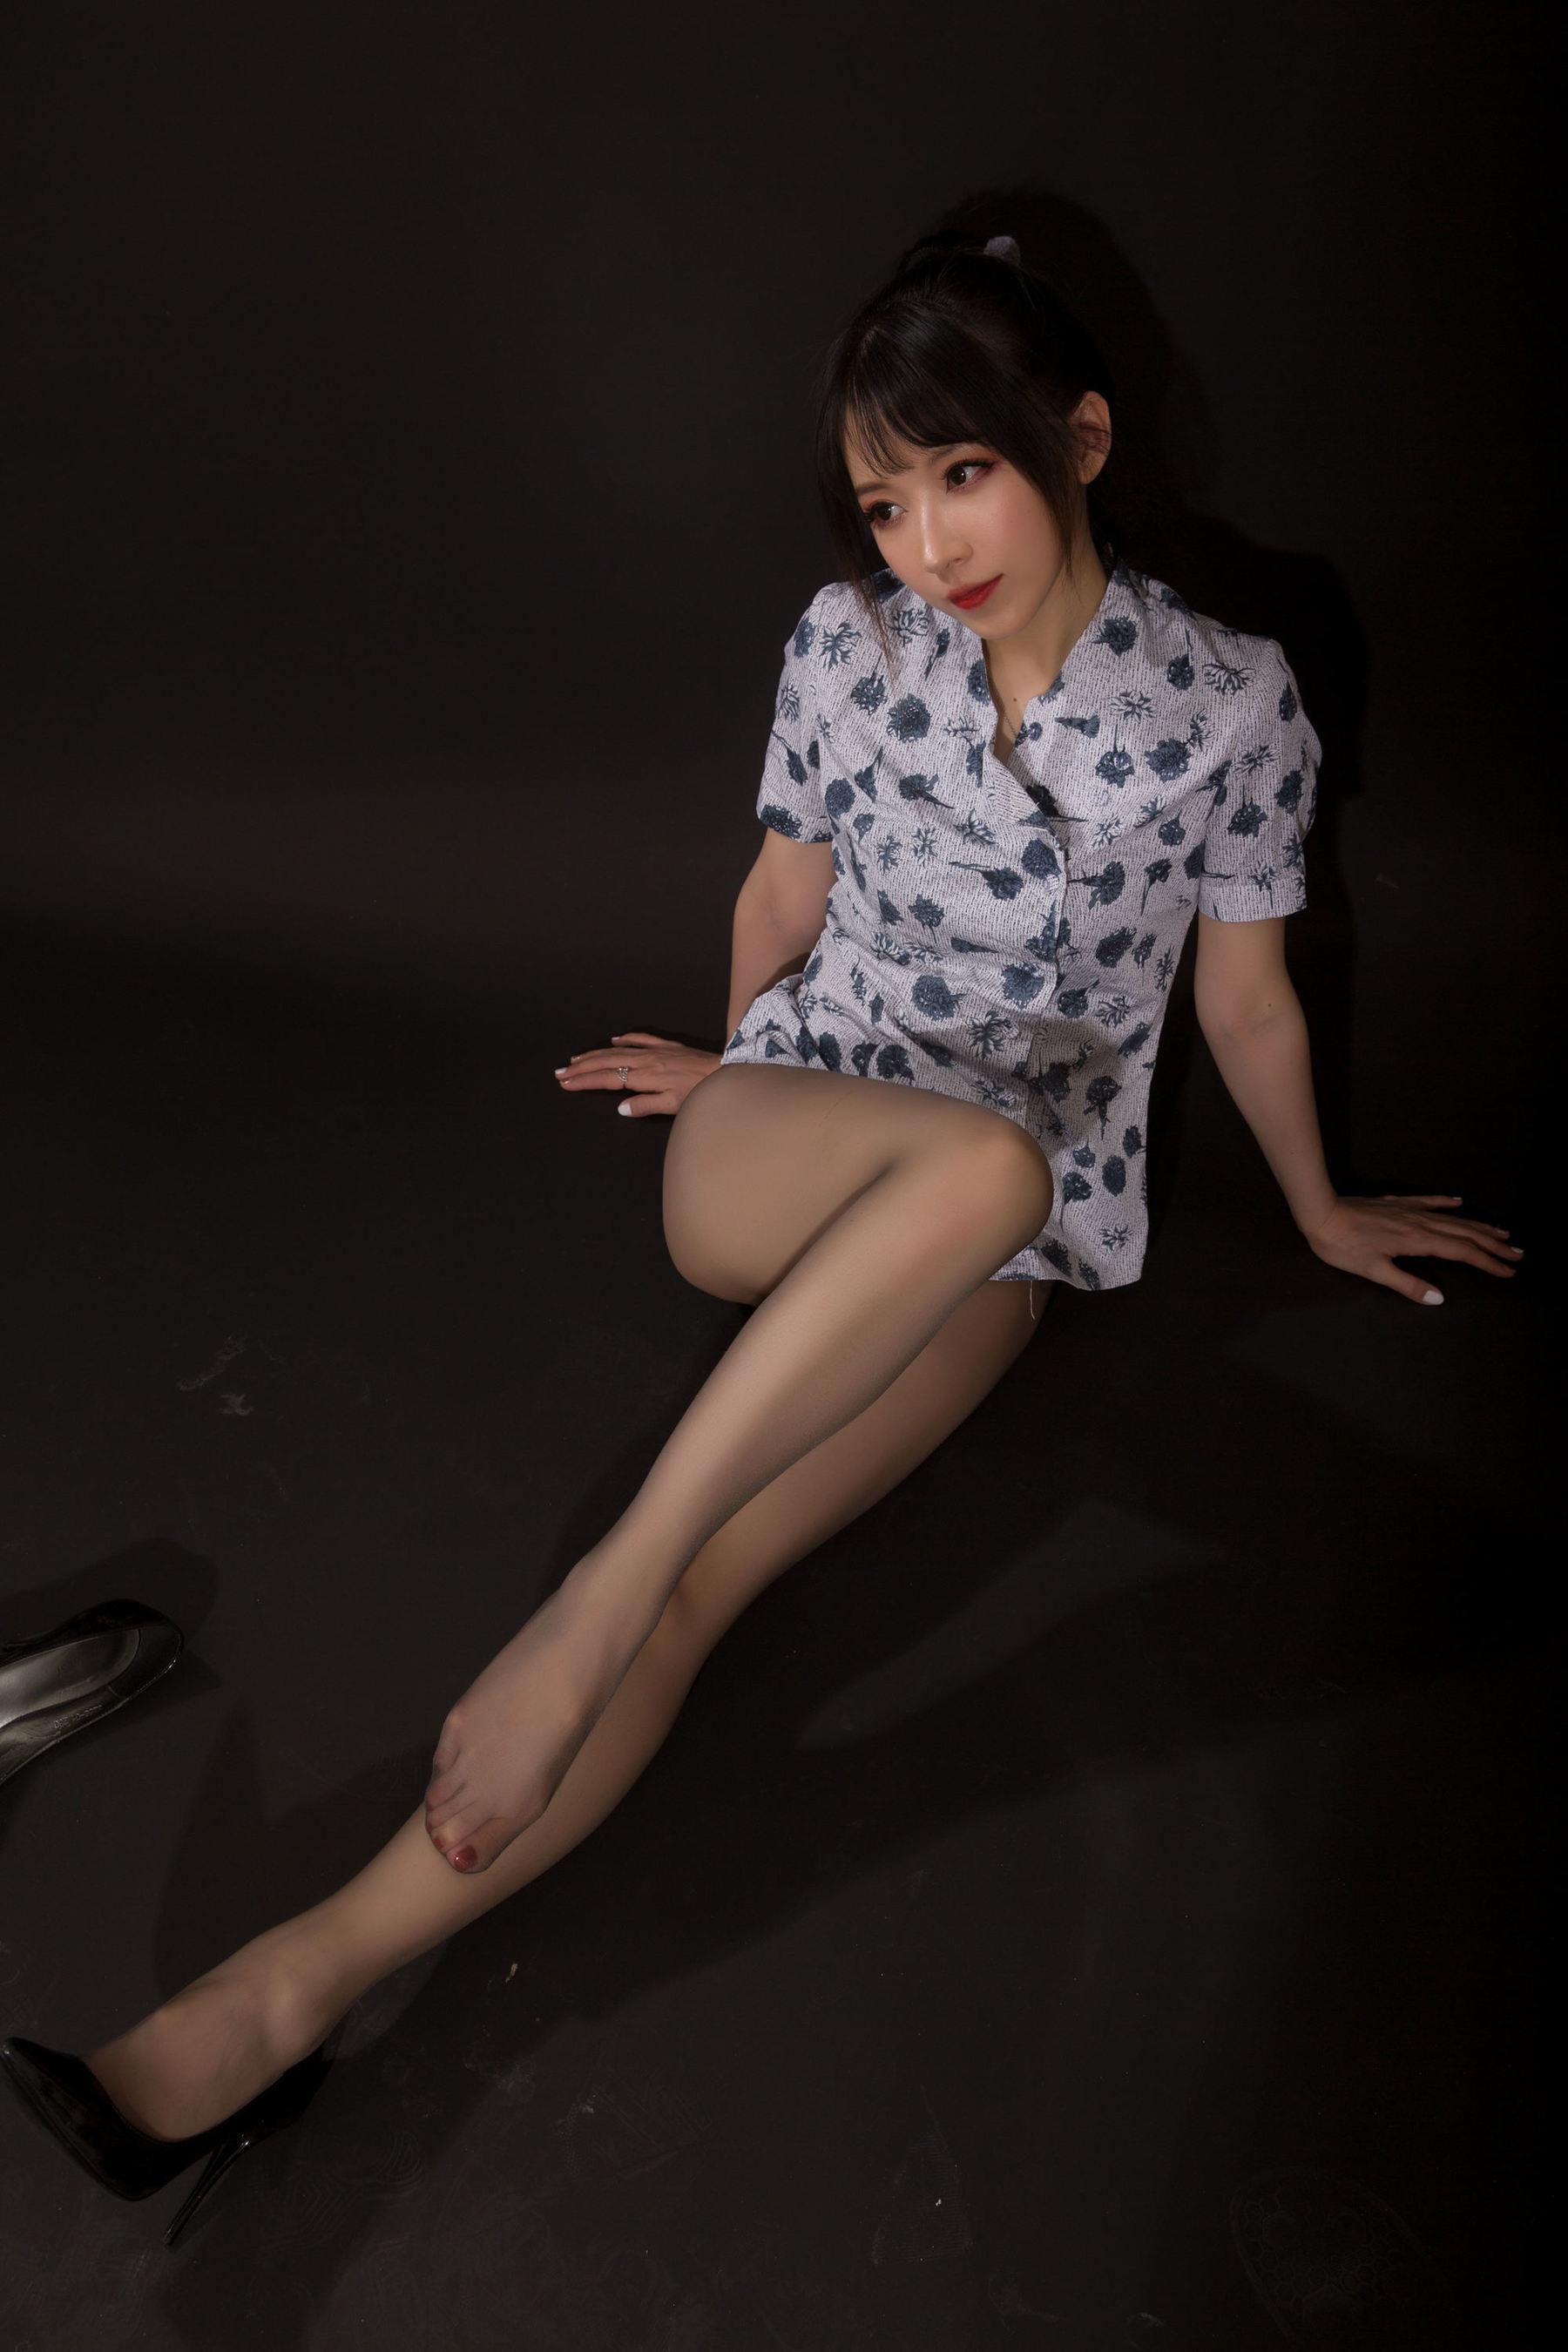 VOL.839 [网络美女]空姐制服:小女巫露娜超高清写真套图(21P)